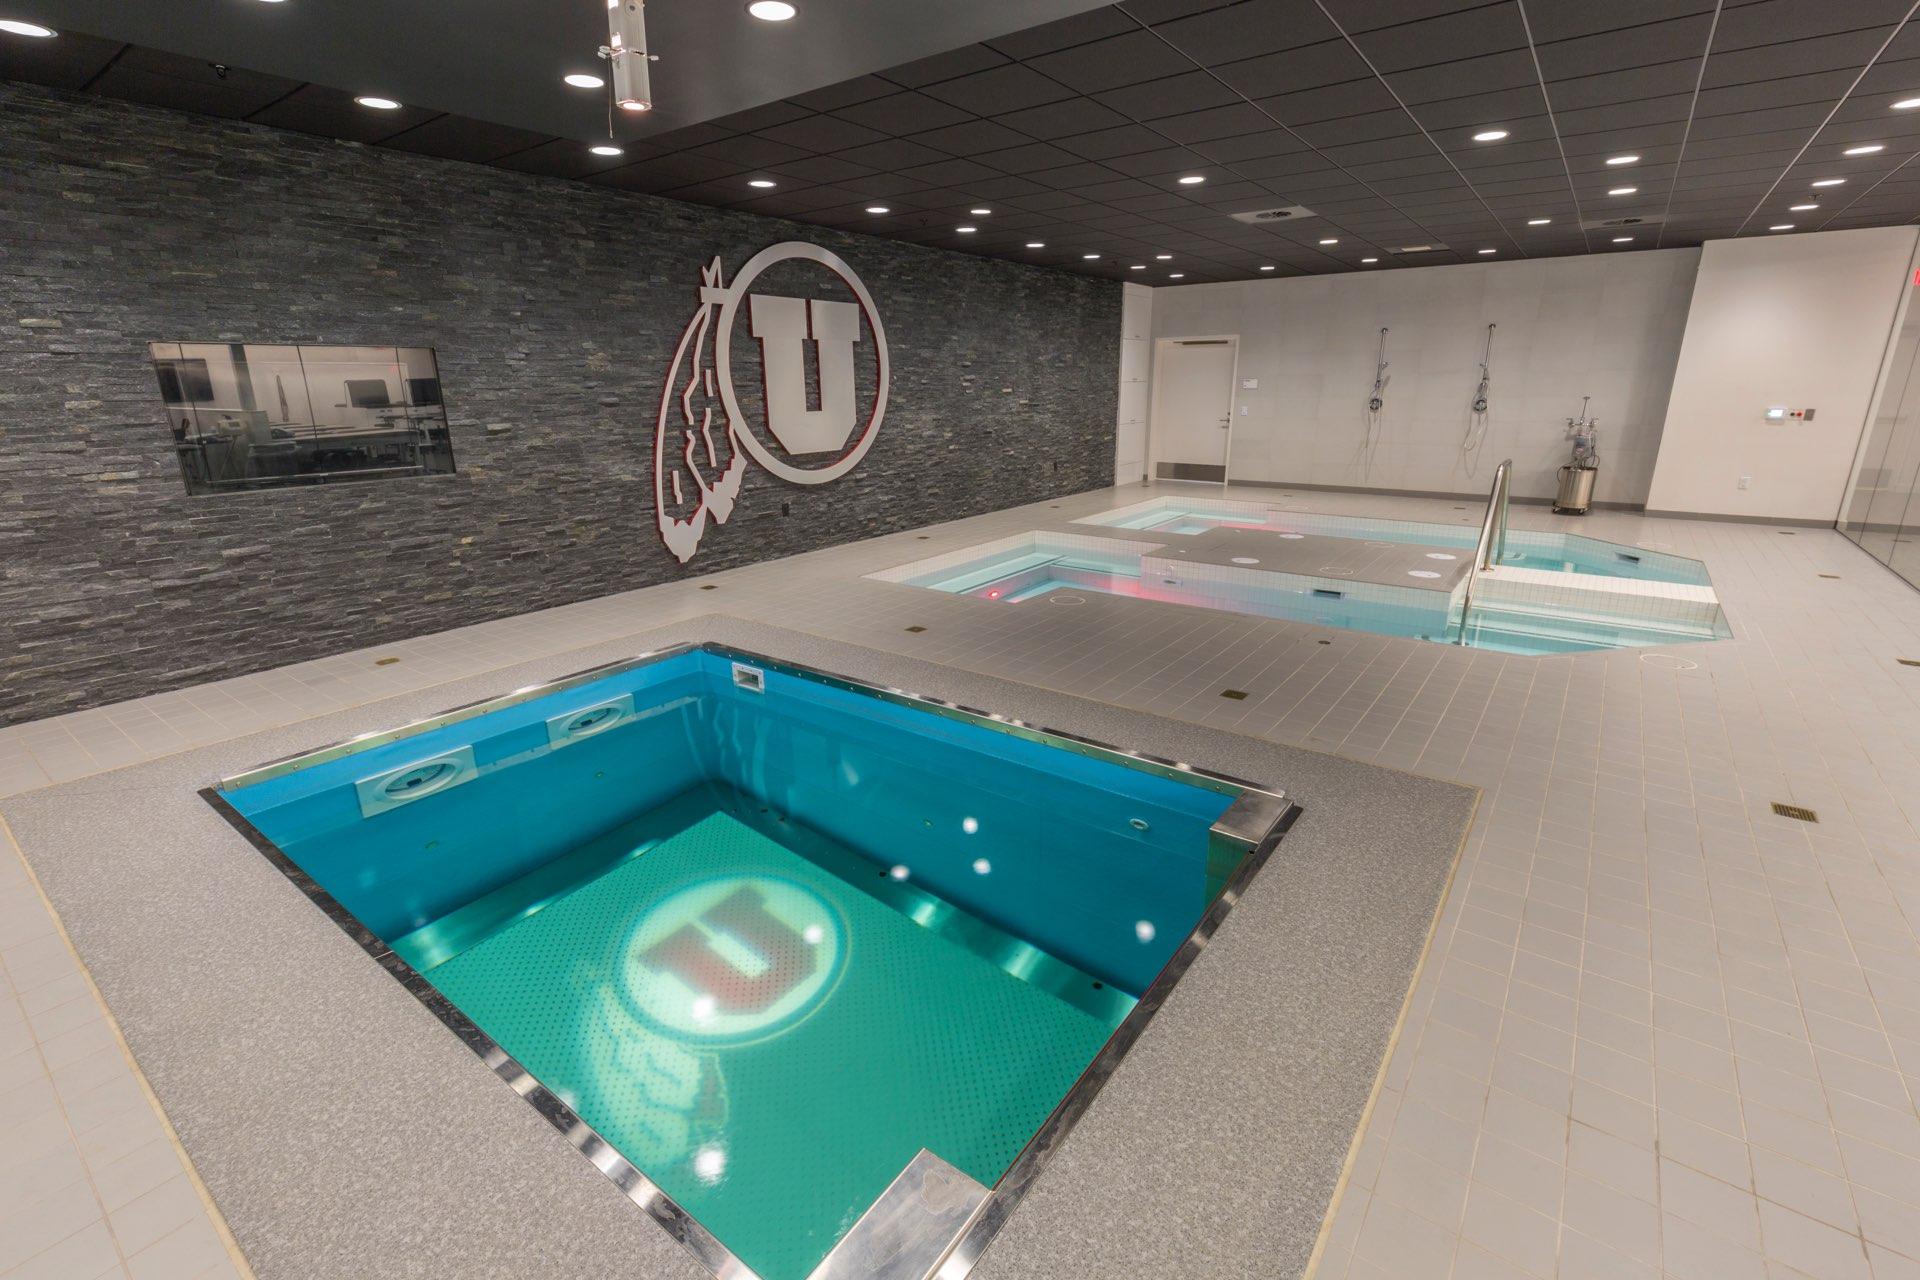 Hot tubs inside the University of Utah Basketball Interior, interior design by Elliott Workgroup